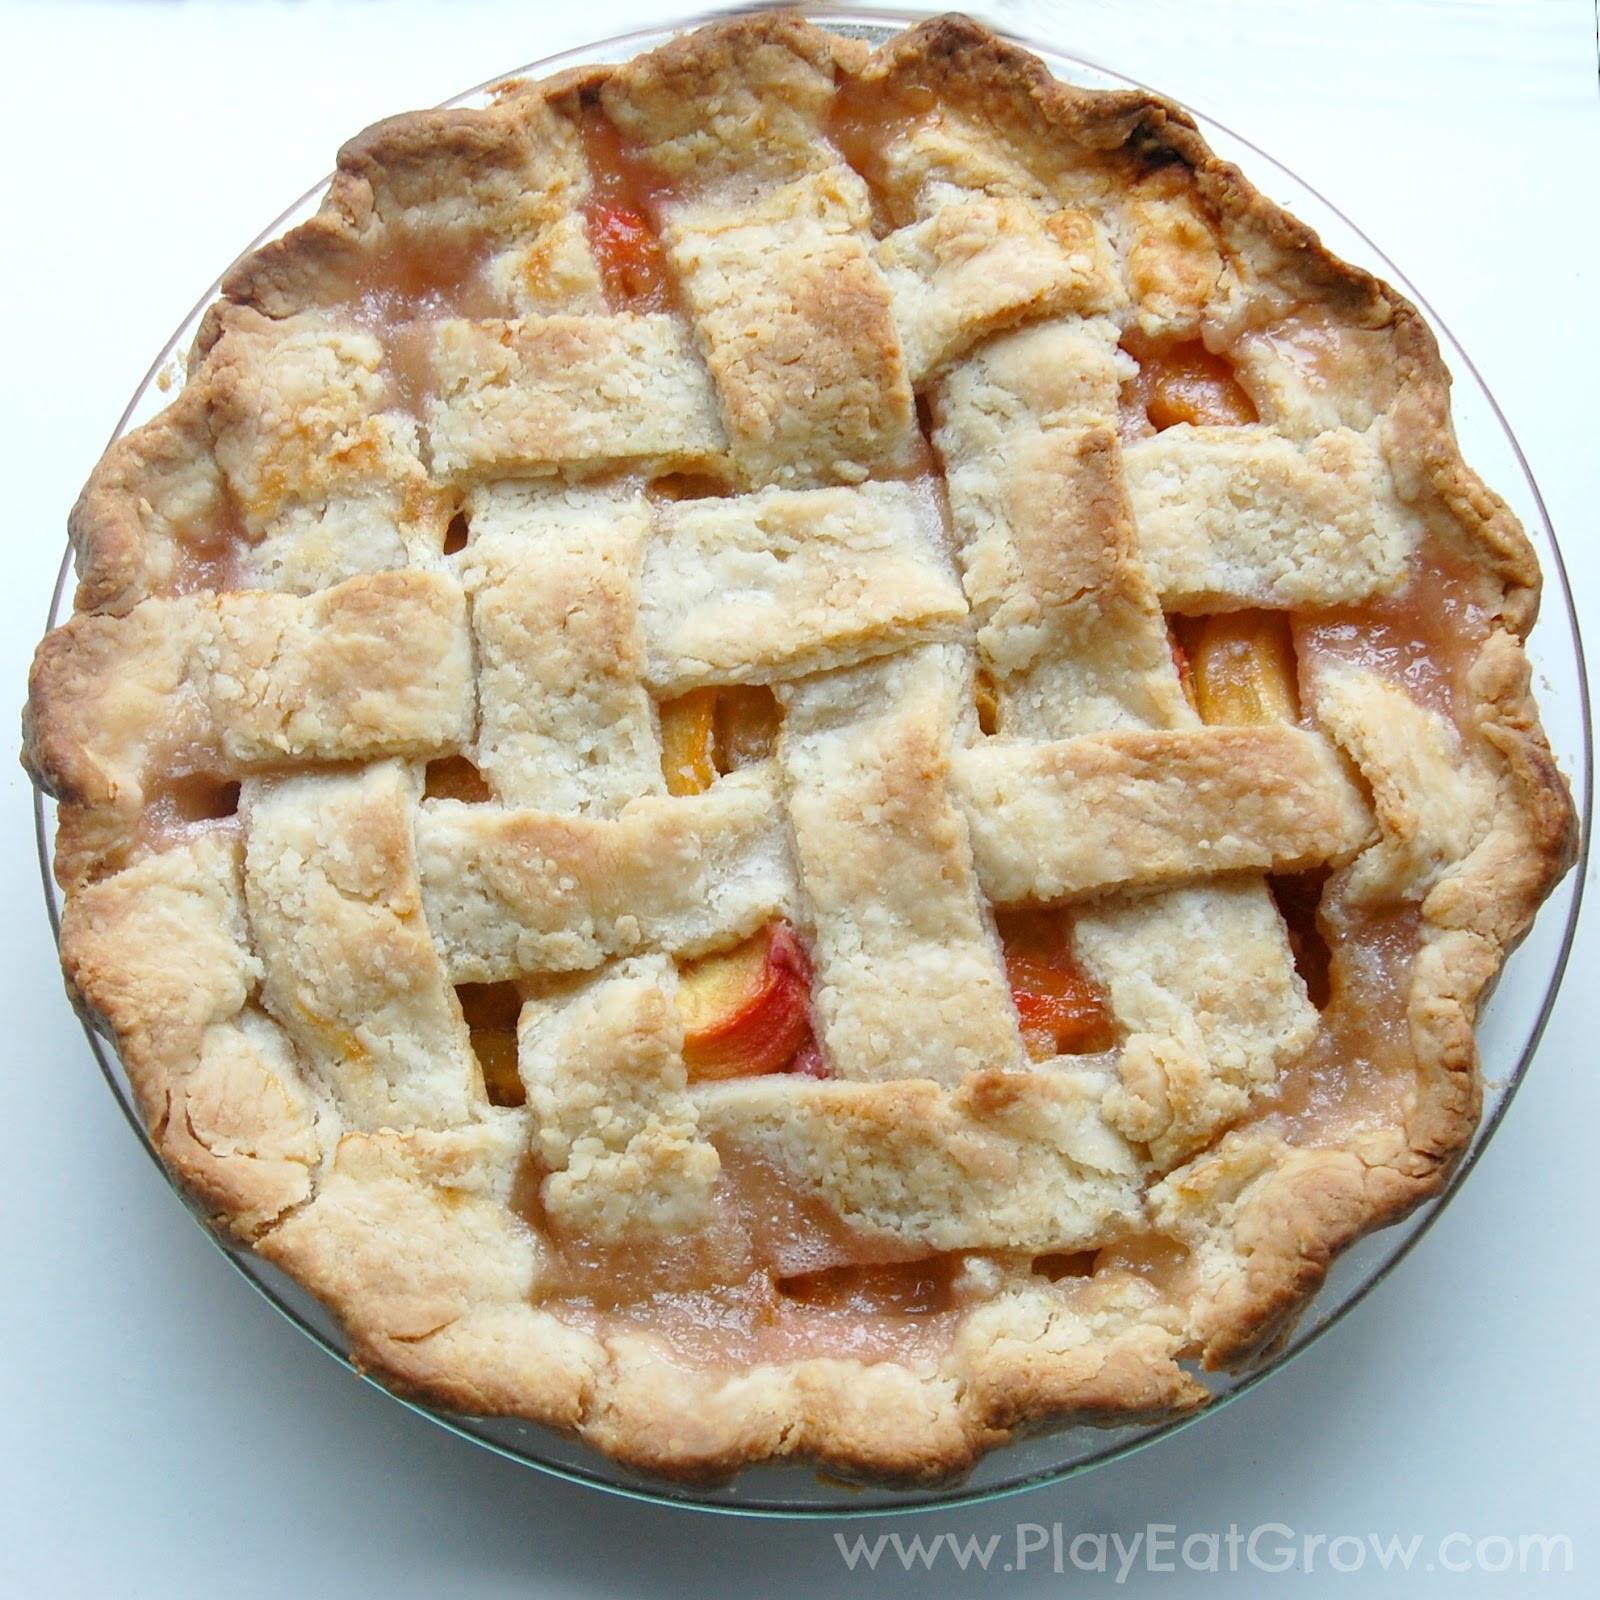 Peach Cobbler Pie  Play Eat Grow Eat Peach Cobbler Pie